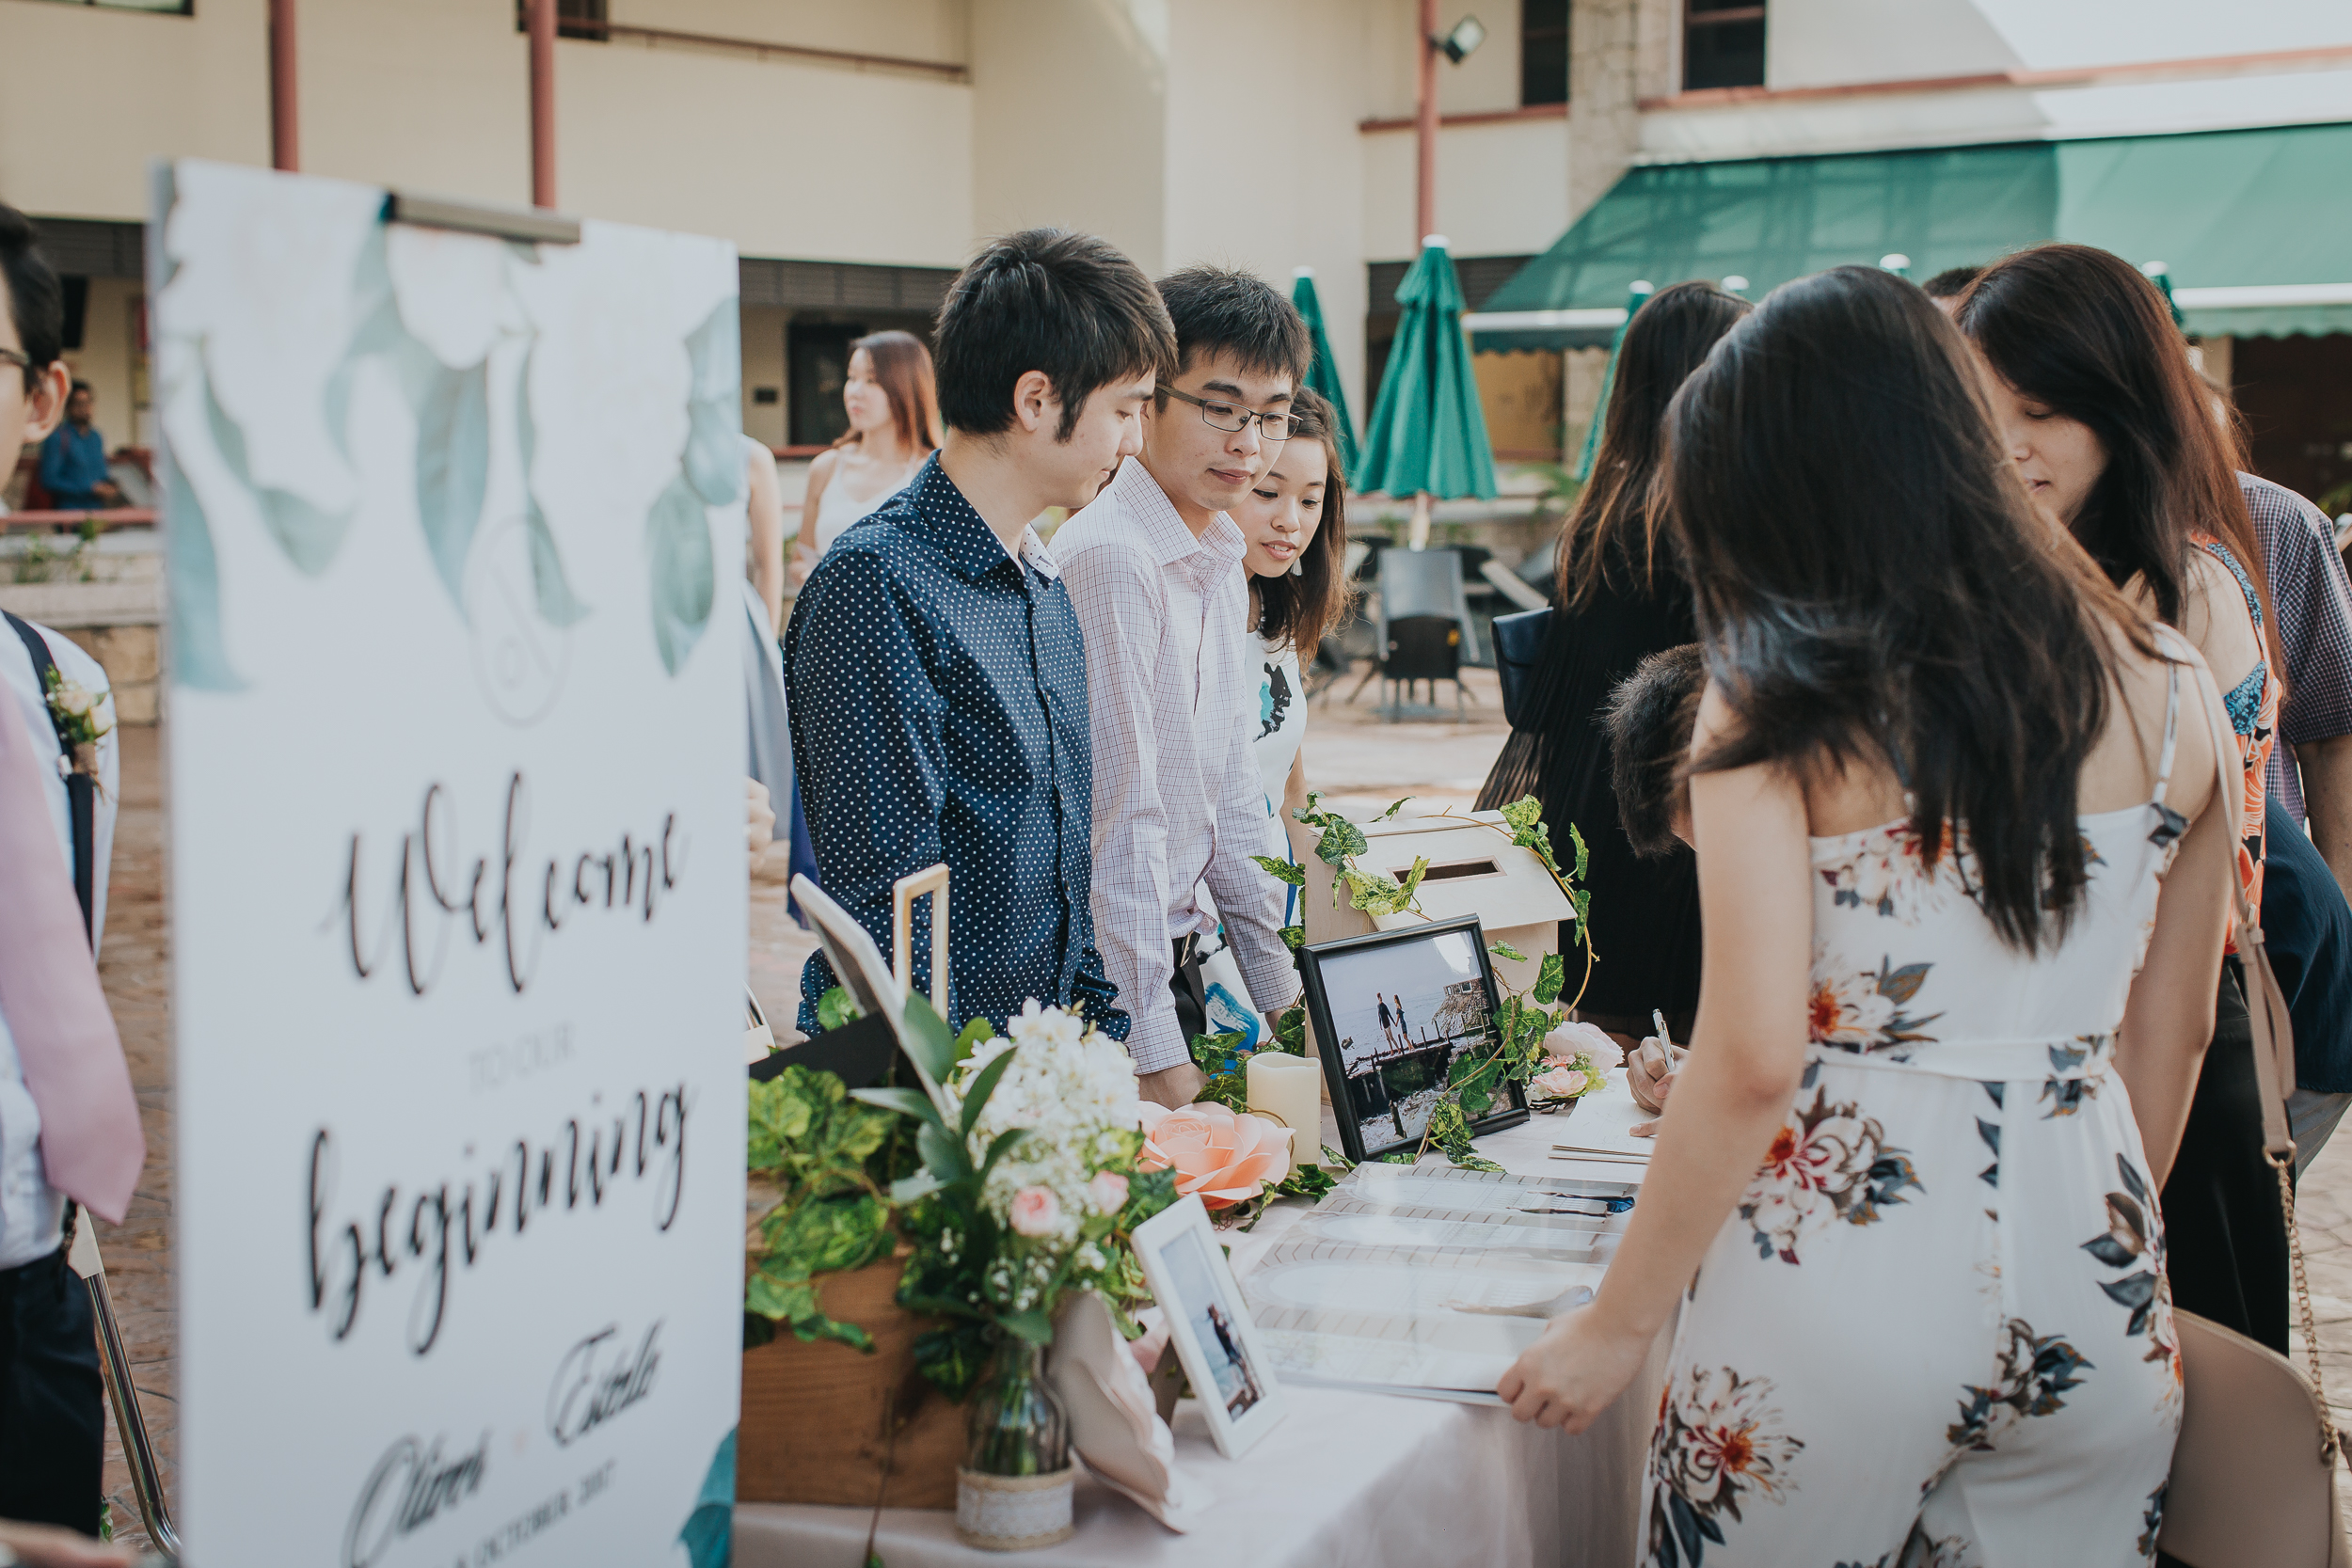 Singapore+Actual+Day+Wedding+Photographer+Grand+Mercure+Oliver+Estelle-0037.jpg